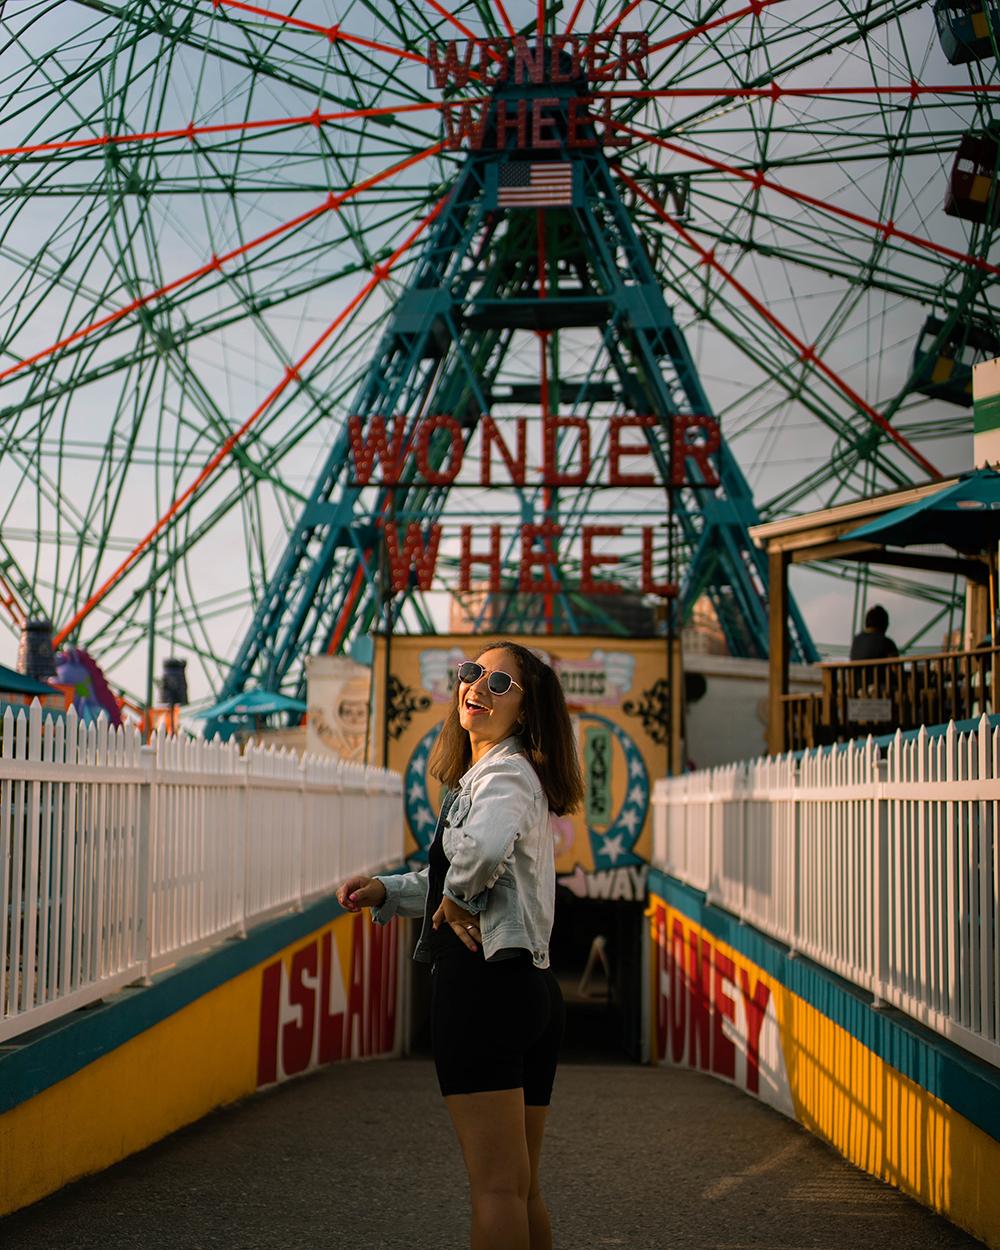 Postcards from Hawaii, NYC, New York City, Itinerary, Coney Island